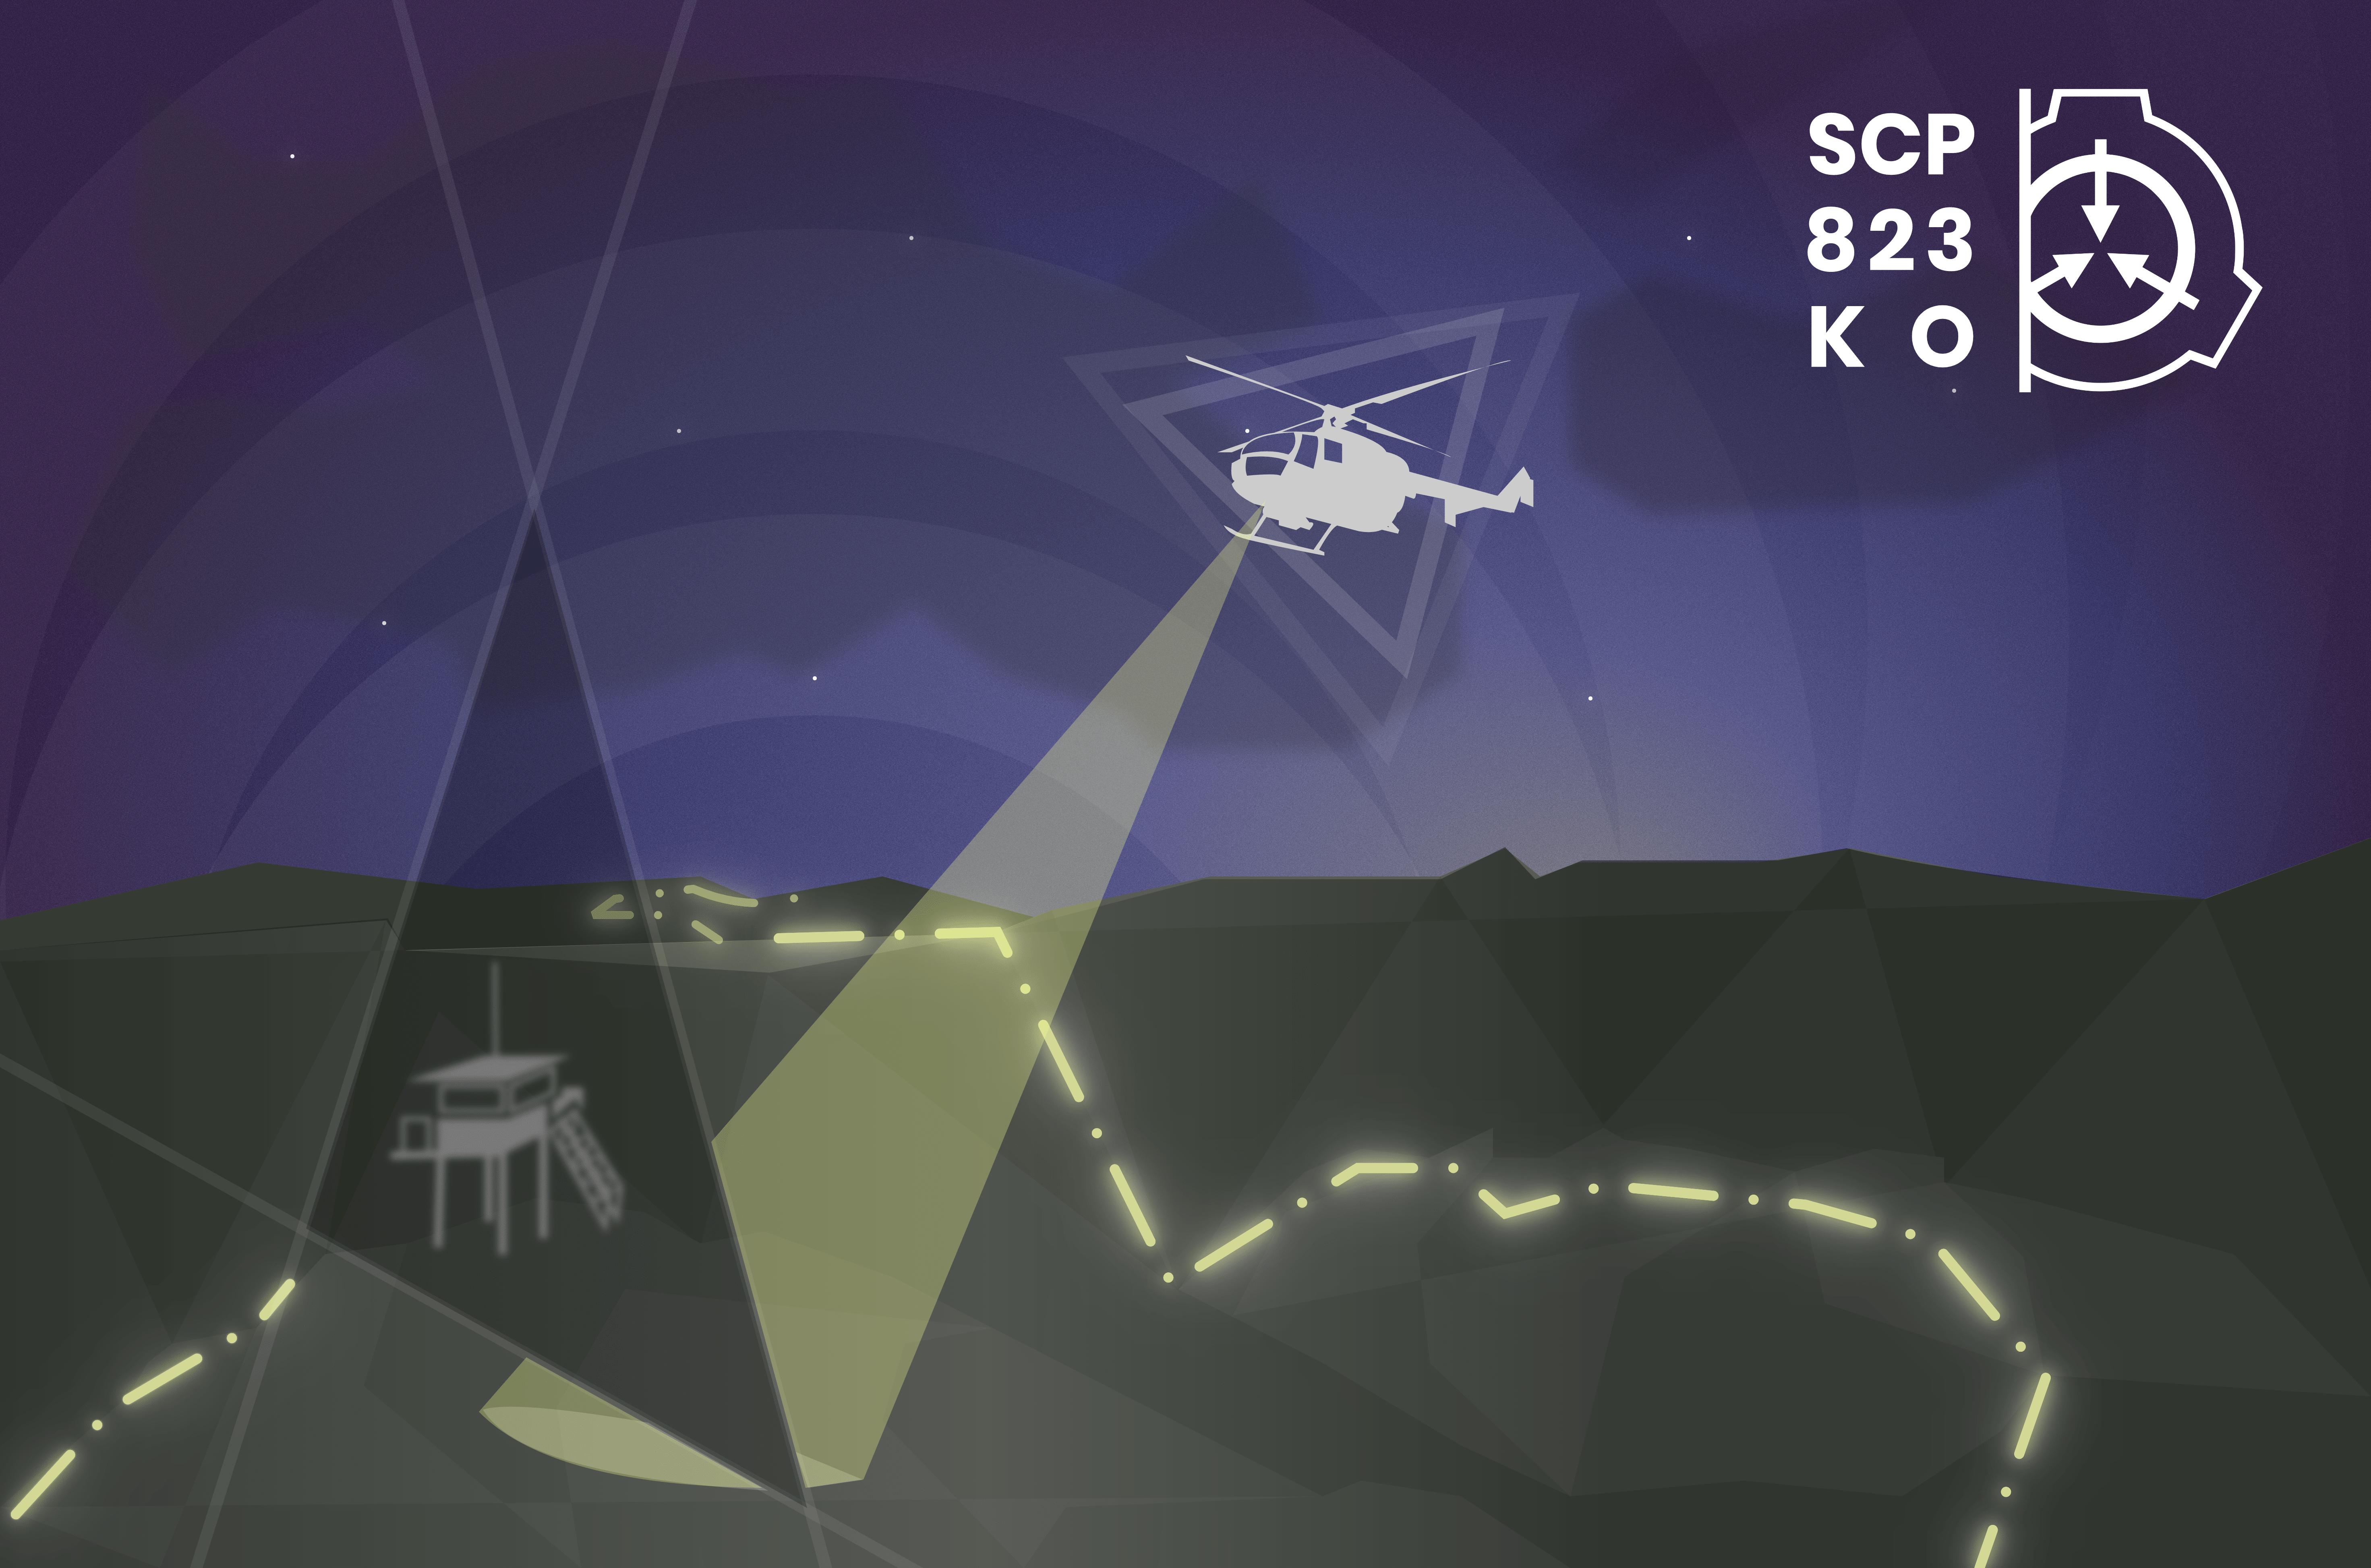 SCP-823-KO.png